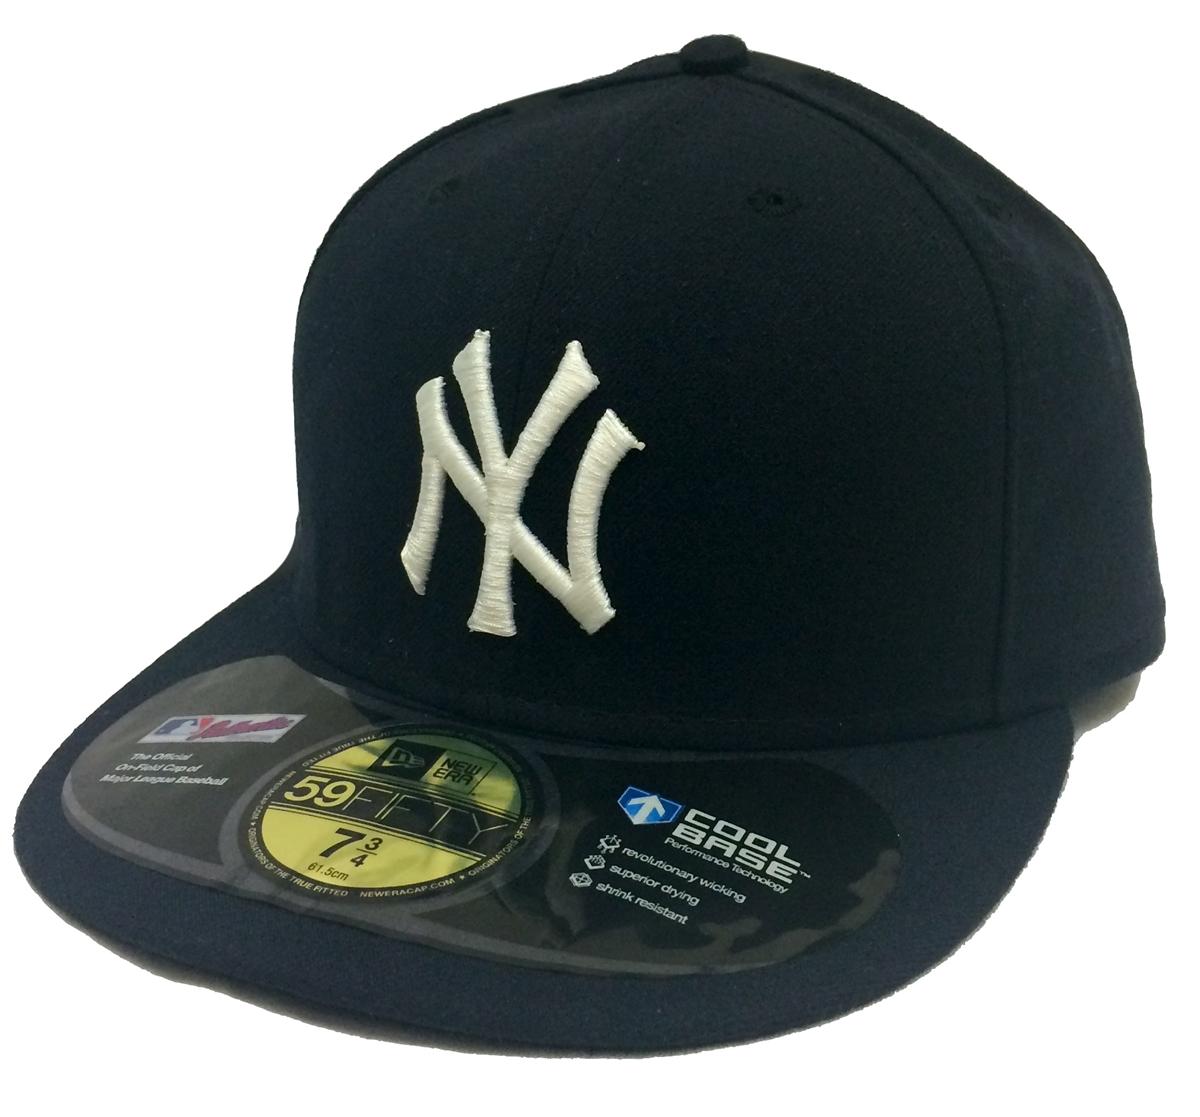 0485d81daa9f8 ... purchase new era 59fifty mlb on field inaugural season 2009 new york  yankees navy fitted cap ...